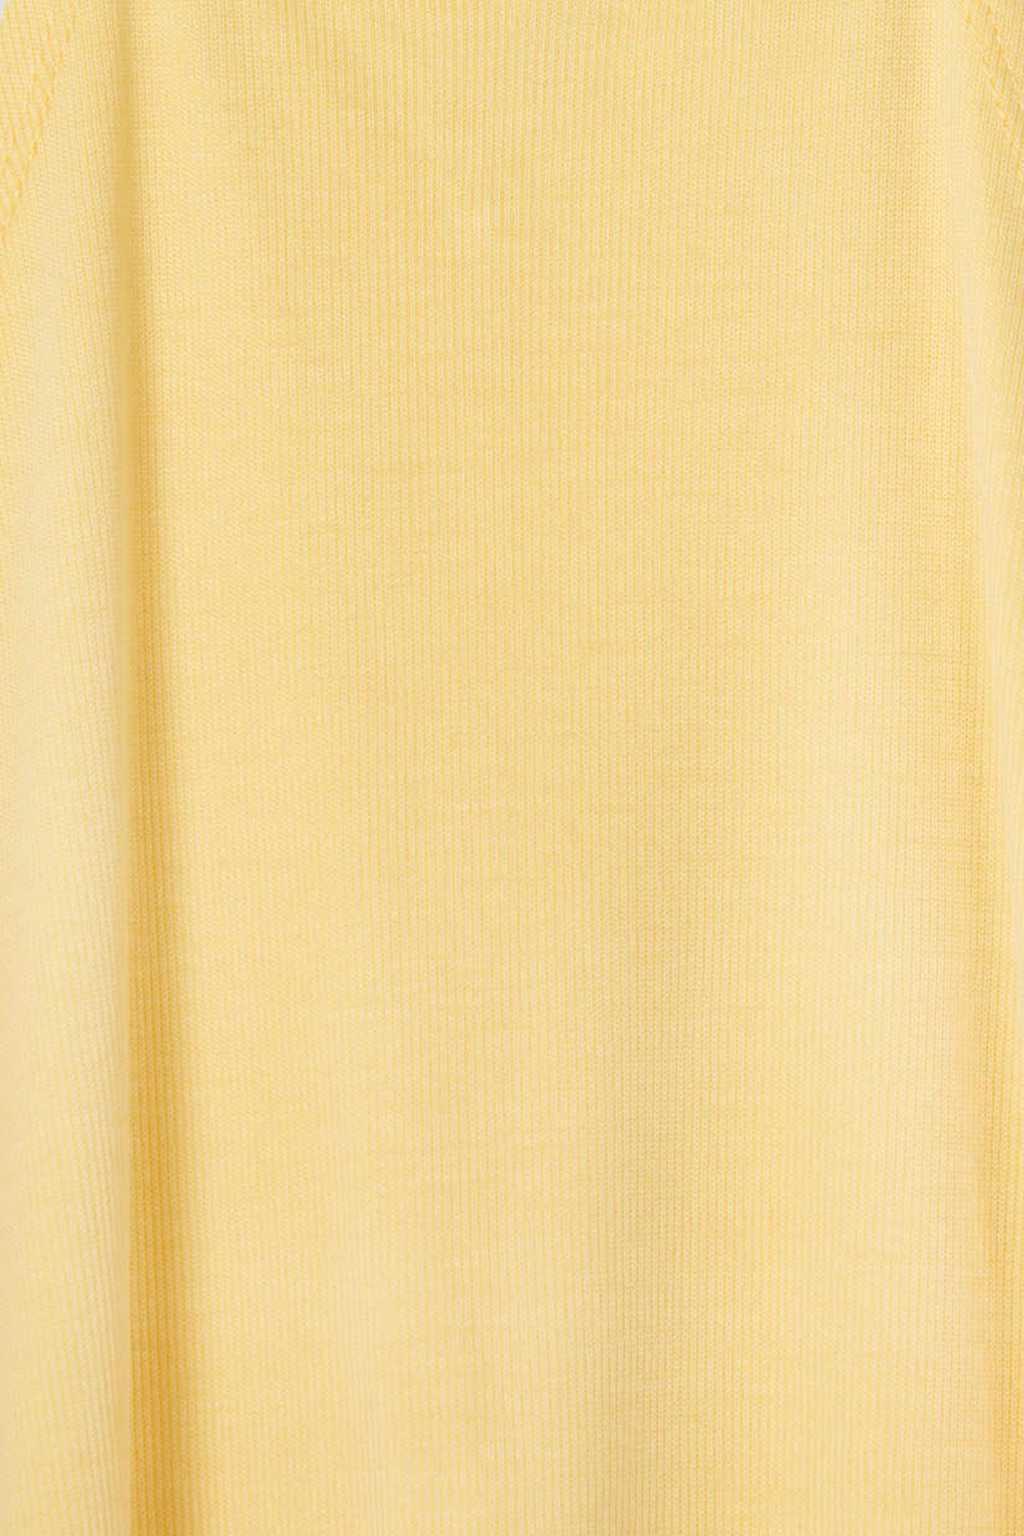 Tank 2308 Yellow 10